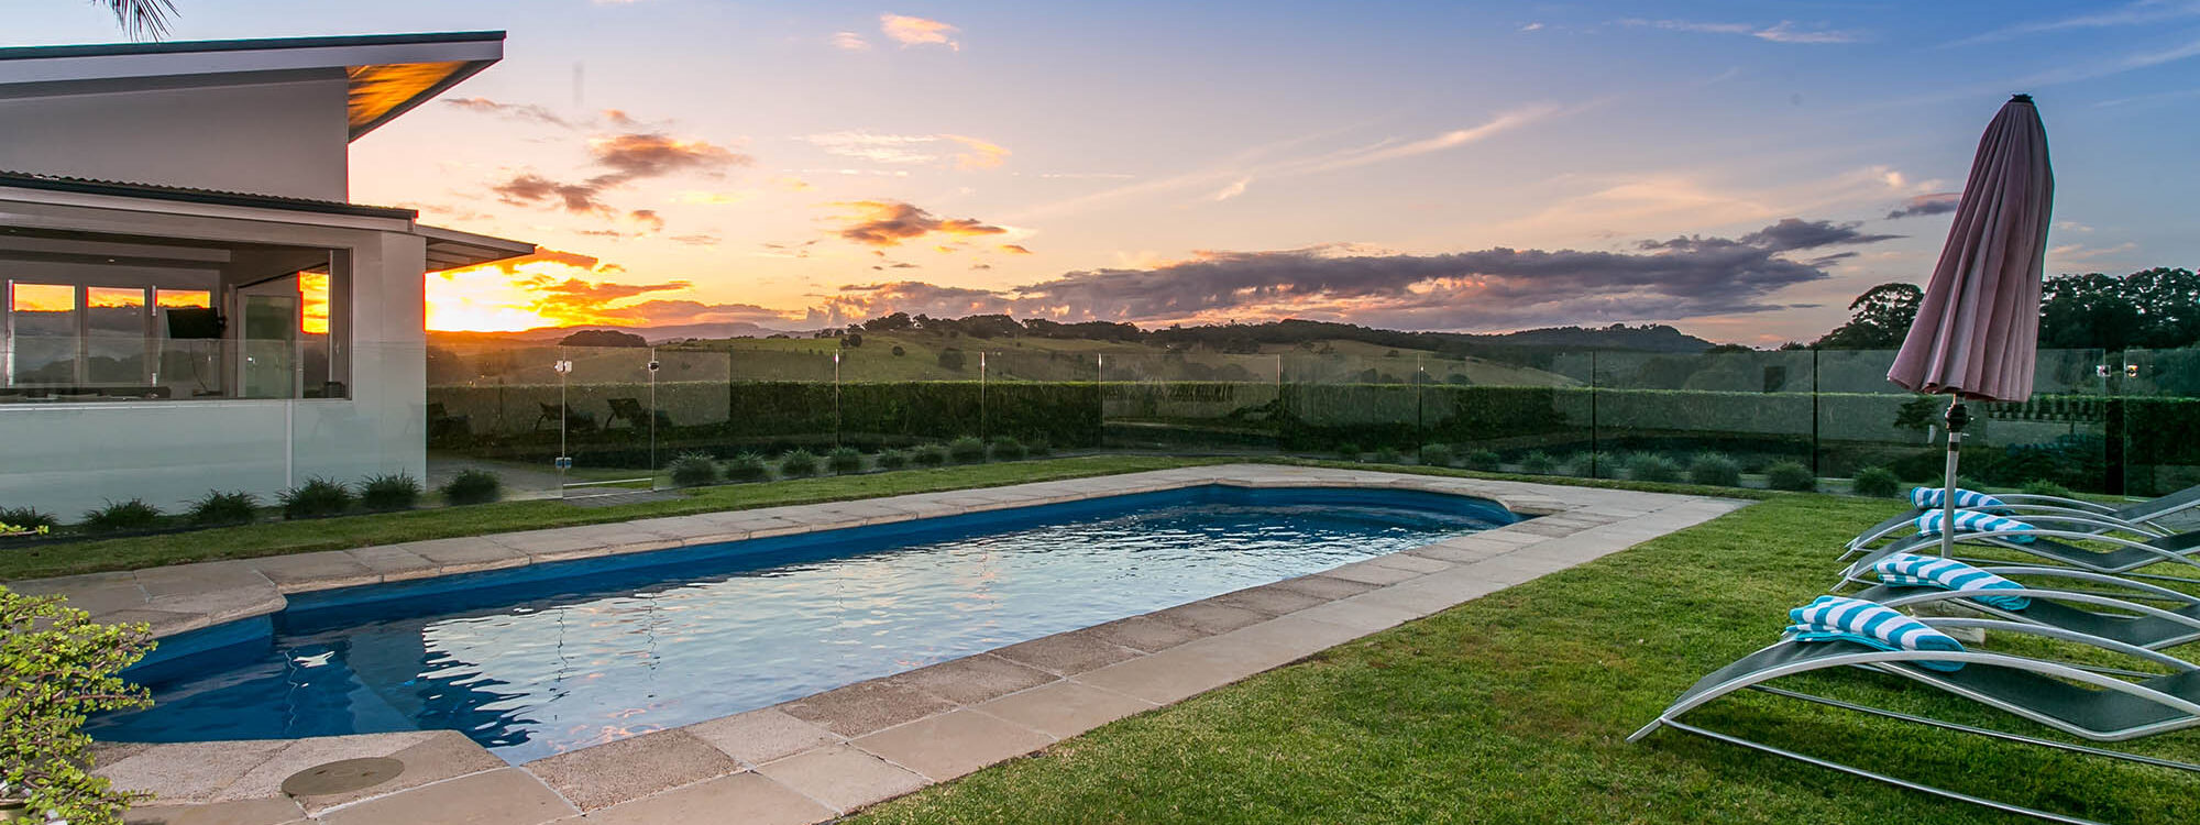 Byrons Brae - Byron Bay - Pool and Cabana f